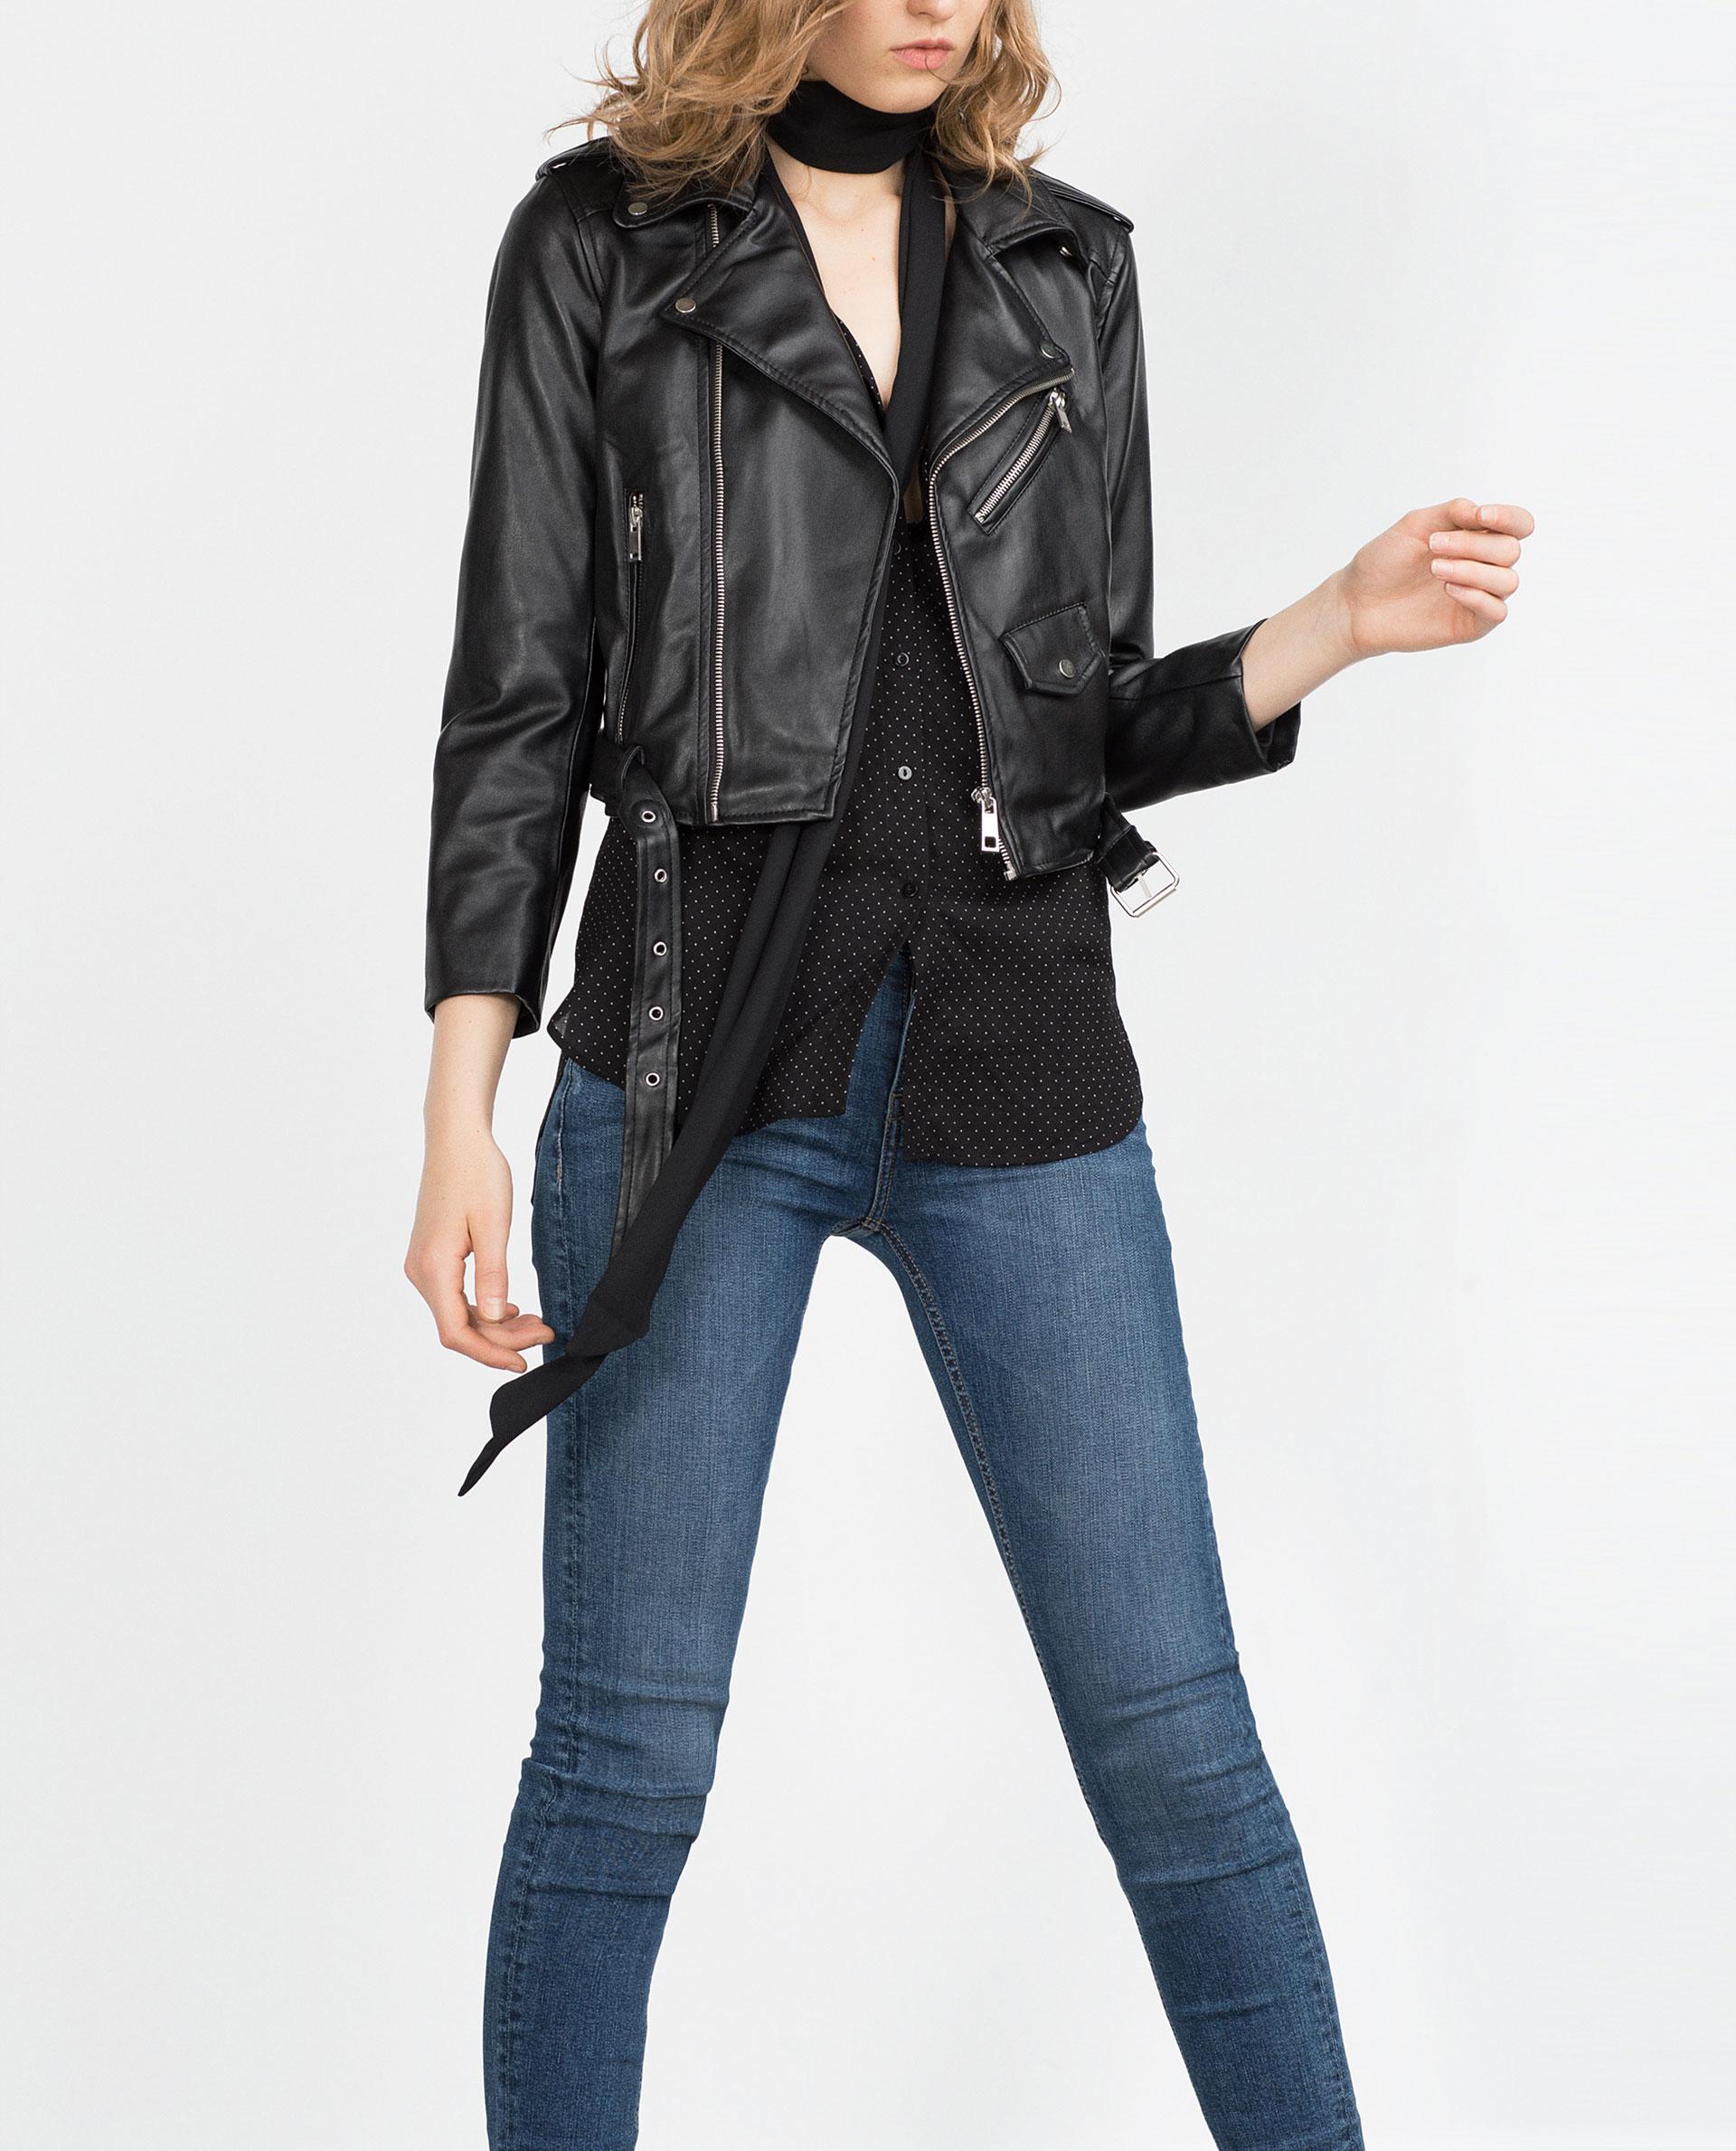 Model Women39s Faux Leather Pants Women39s Black Leather Pants